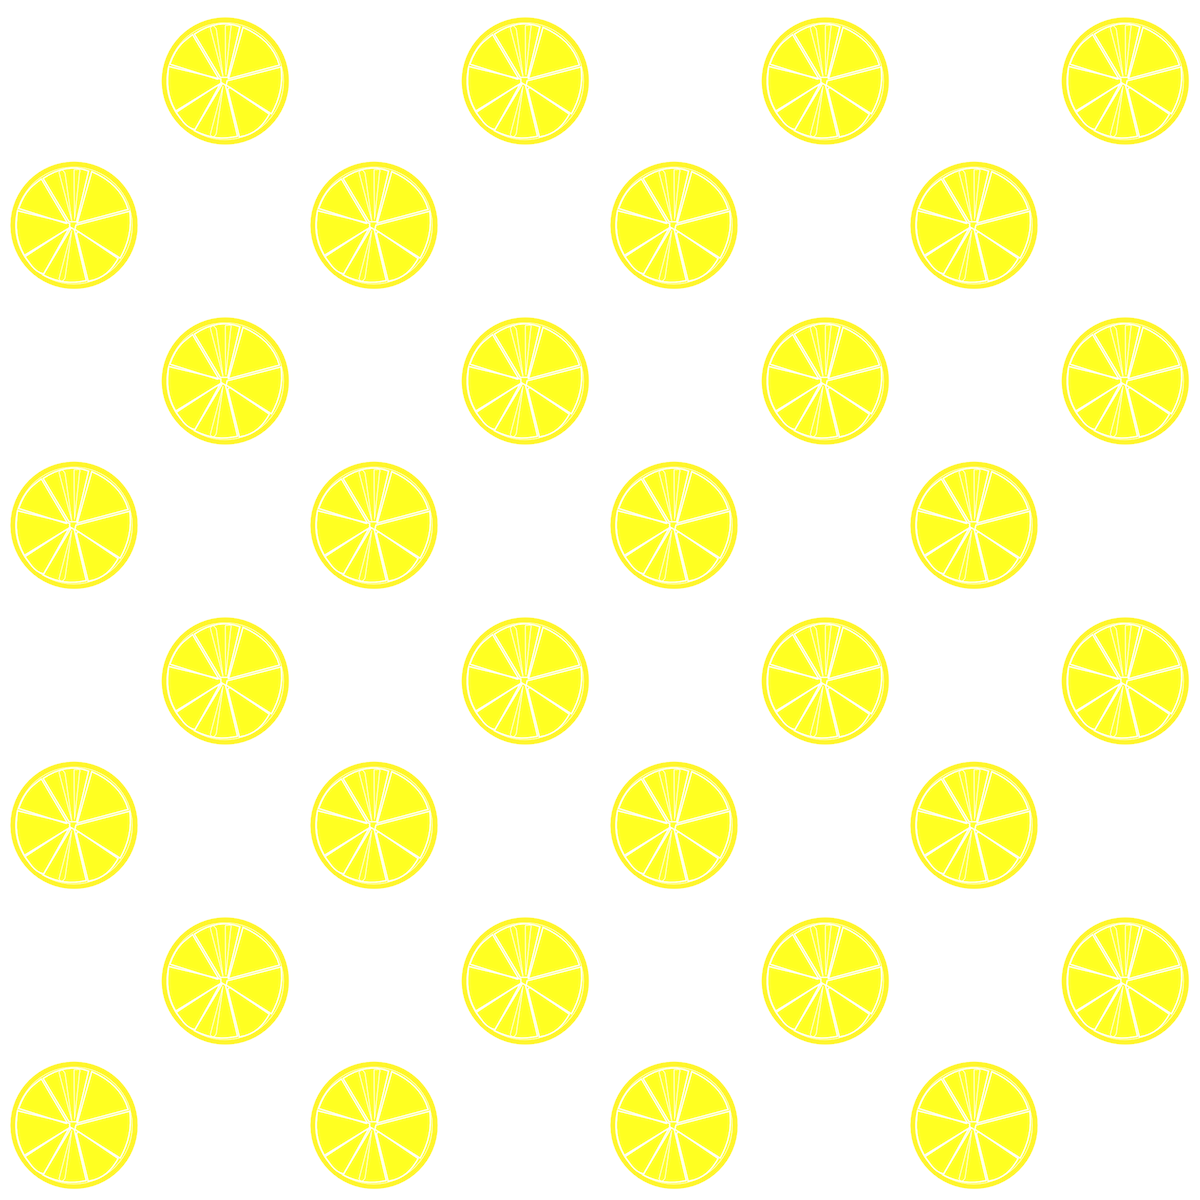 yellow polka dot scrapbook background download free vector art